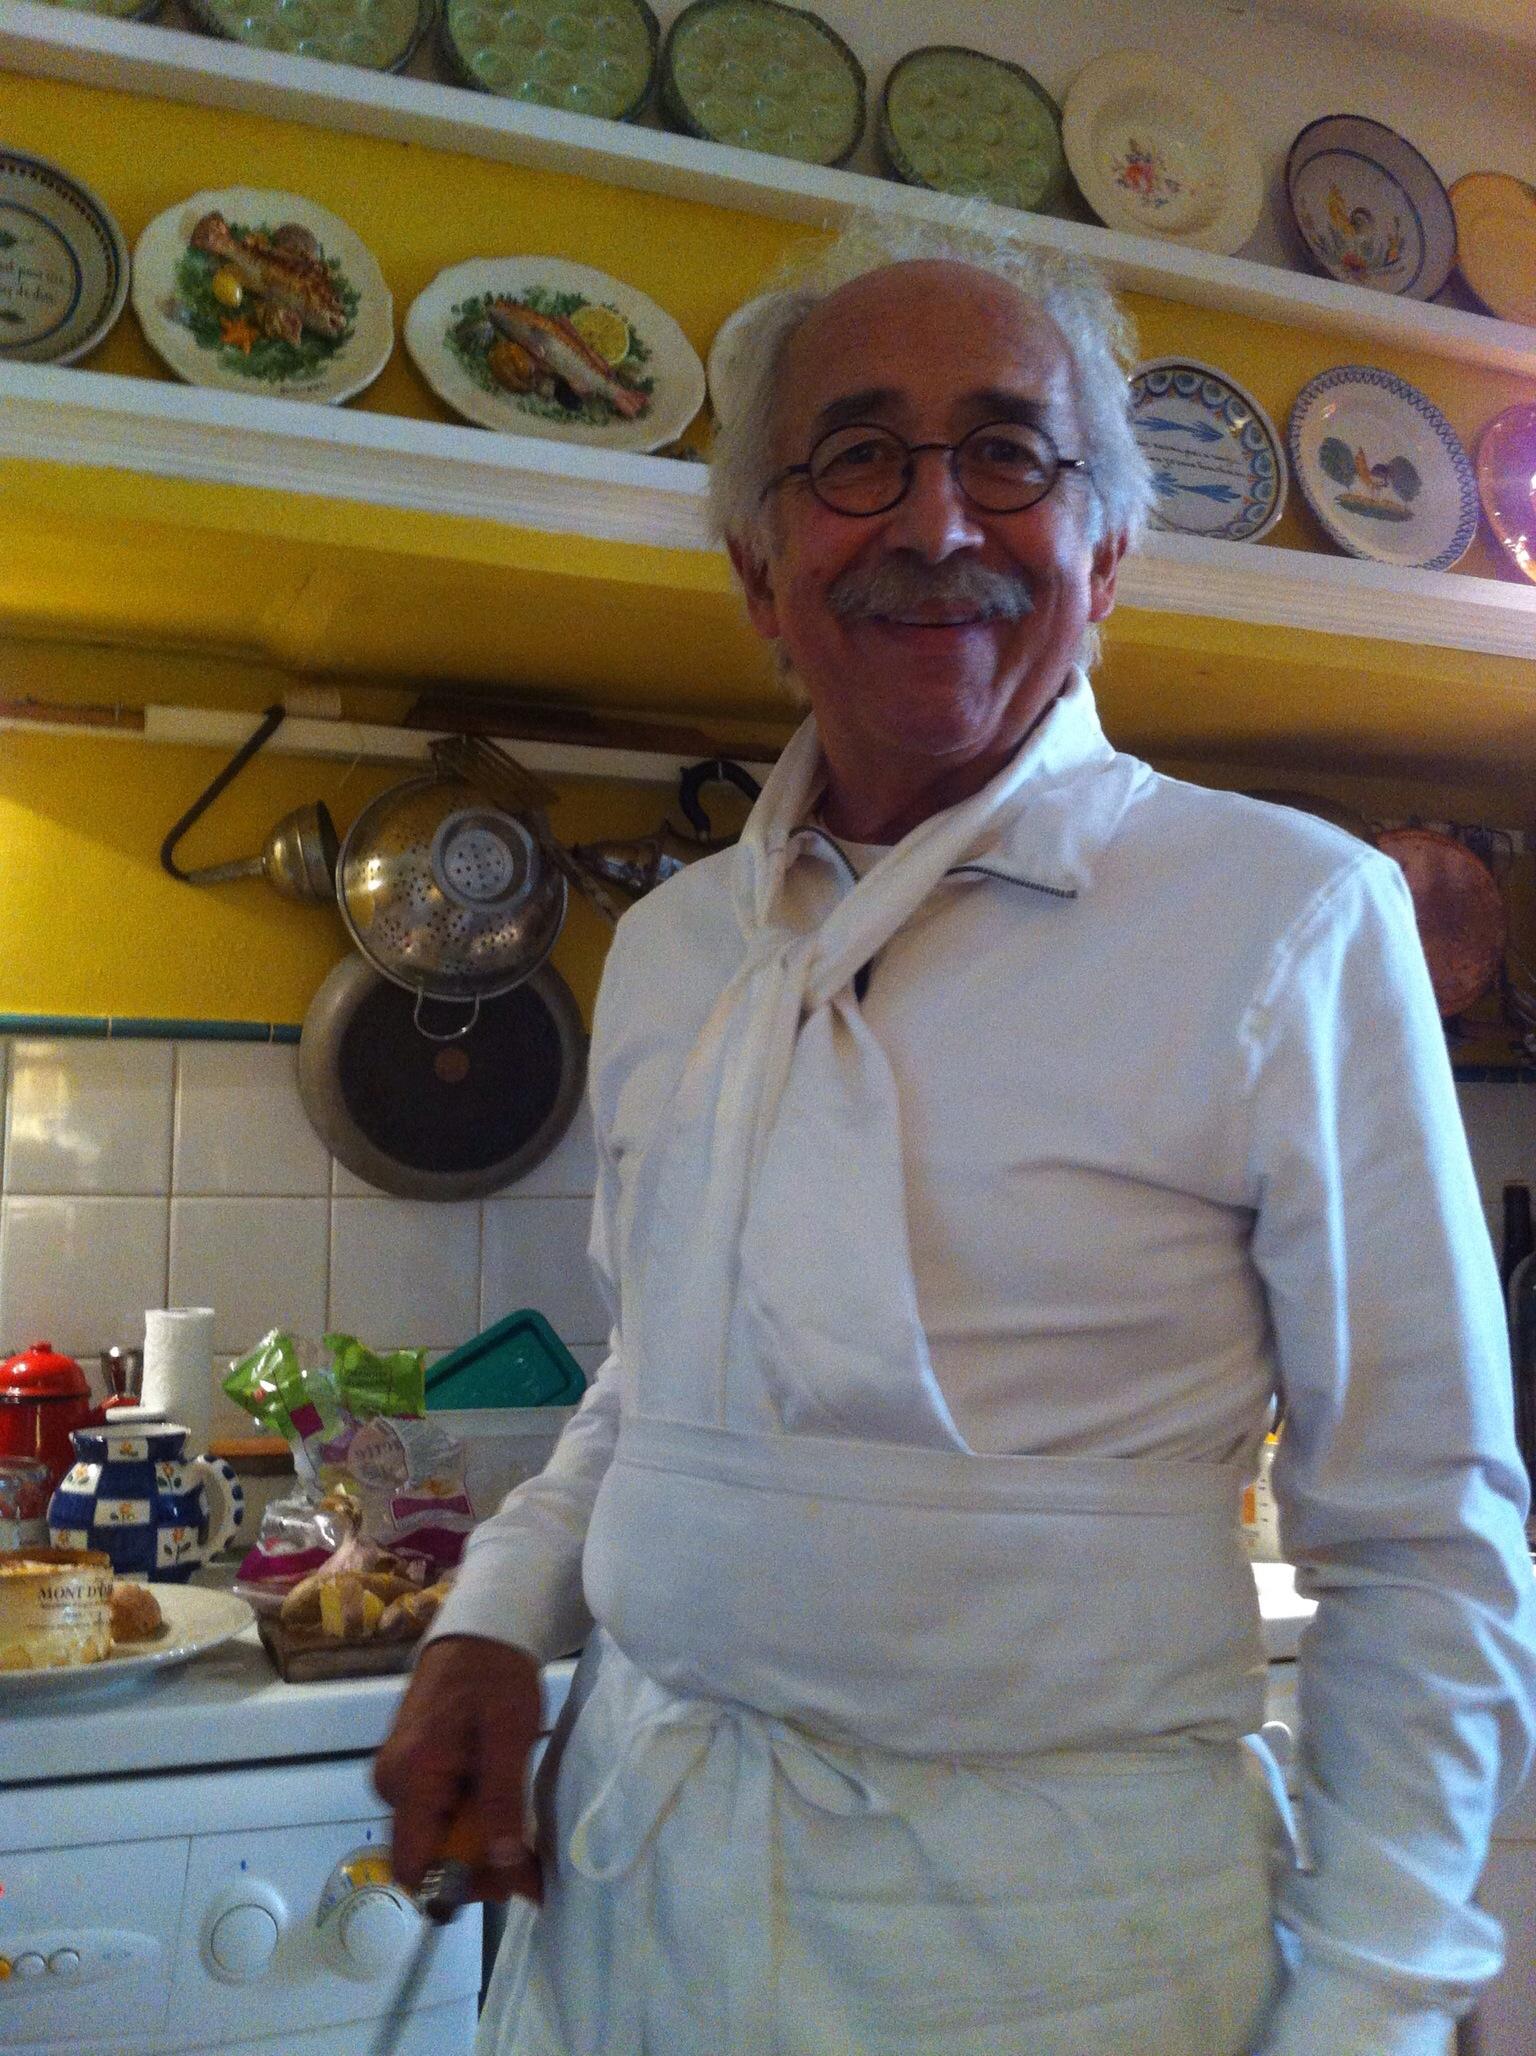 Geoffrey the cook